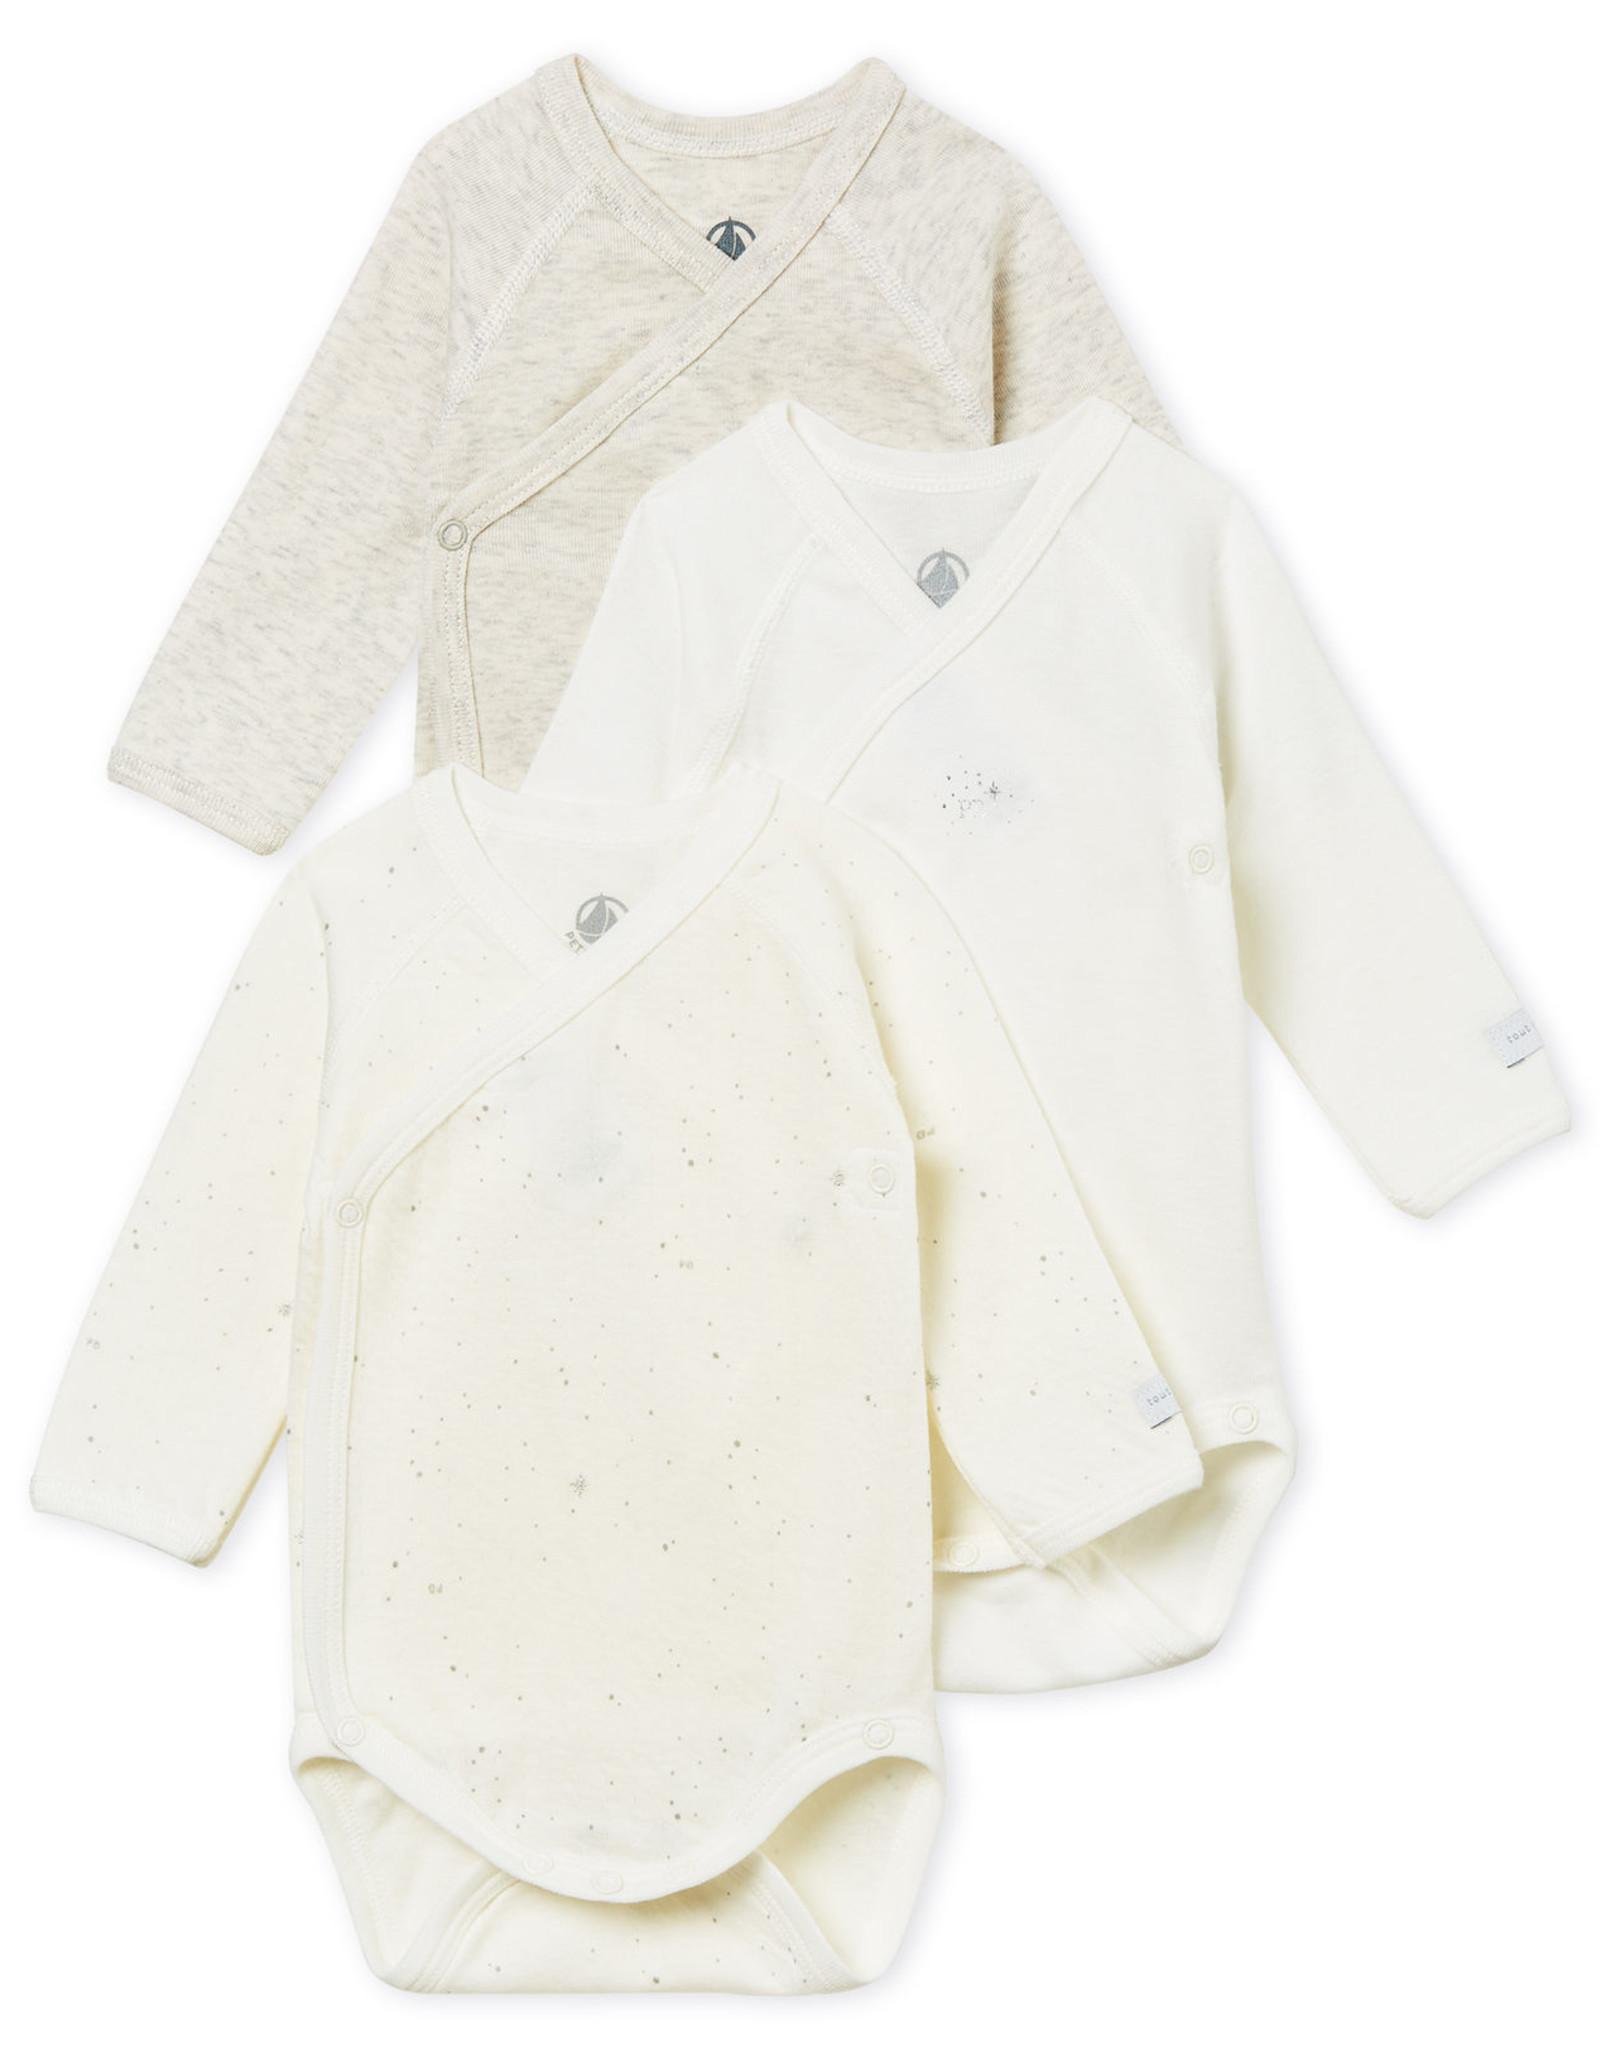 Set of 3 baby bodysuit